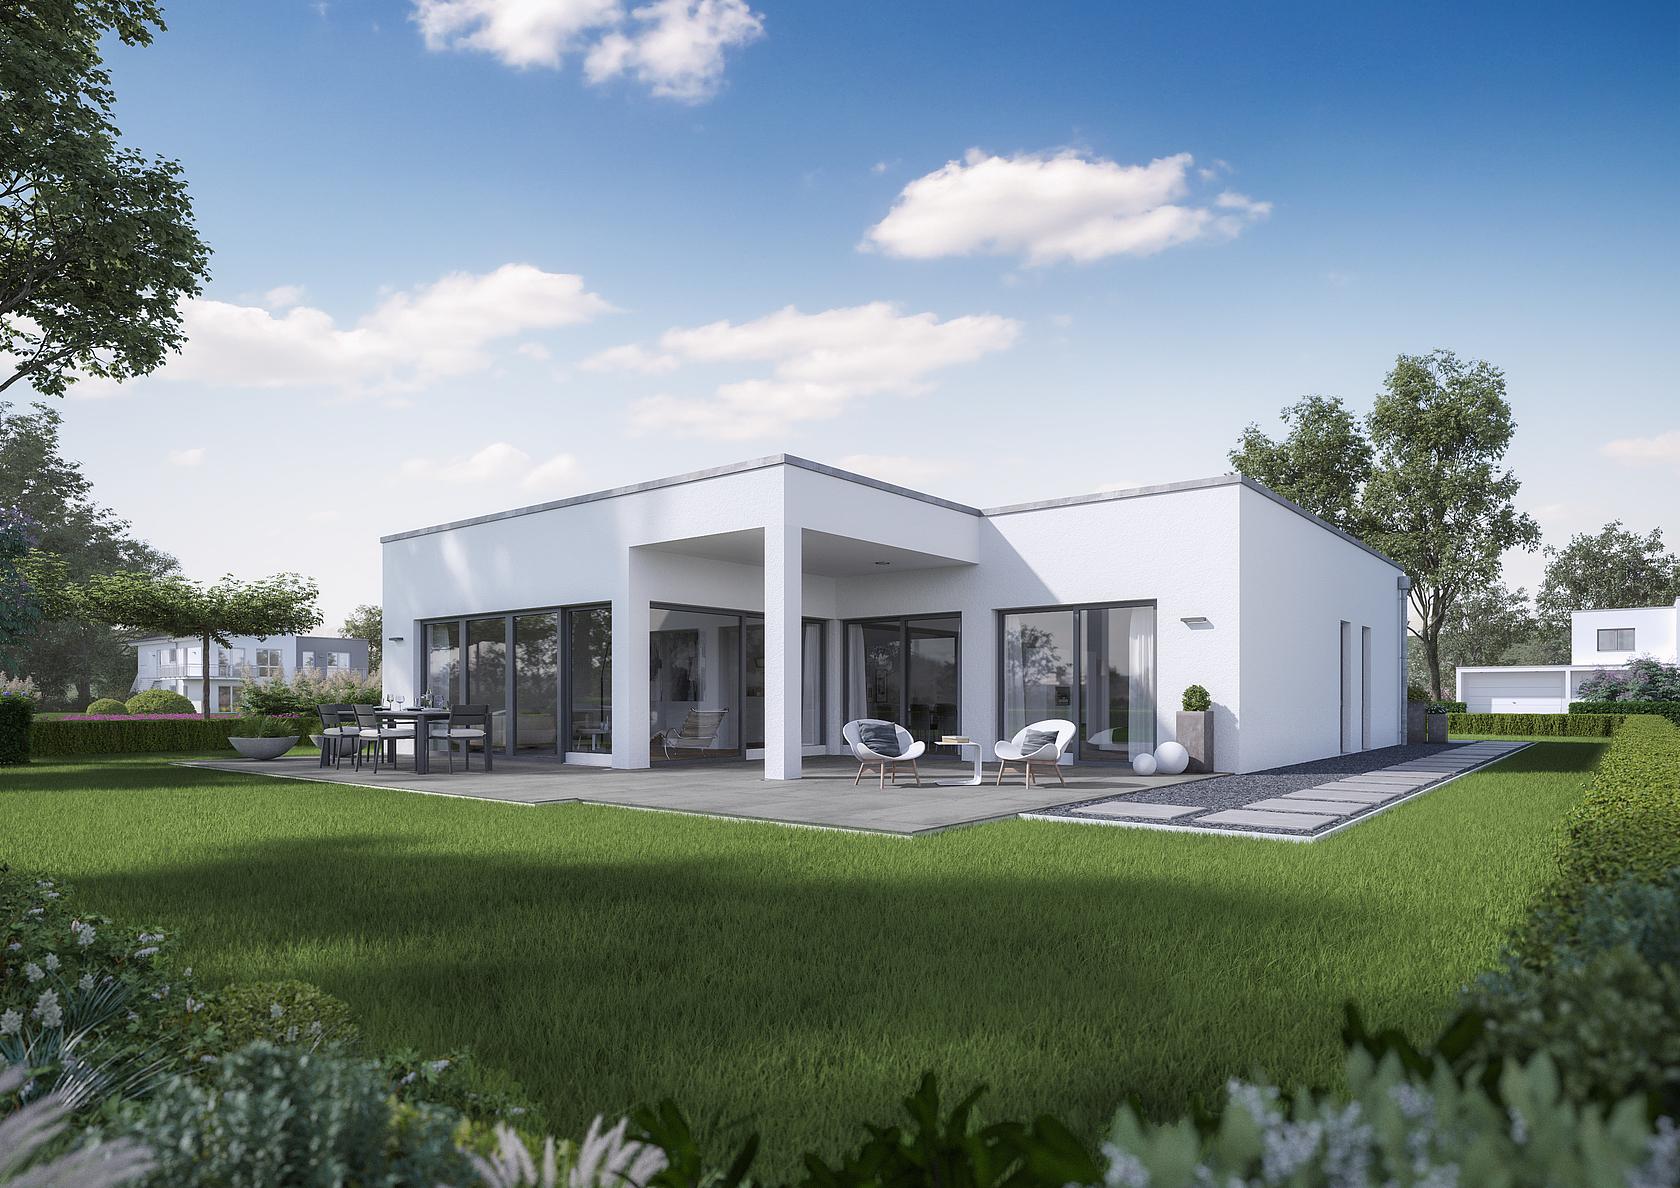 bungalow select bauhaus auf einer ebene. Black Bedroom Furniture Sets. Home Design Ideas